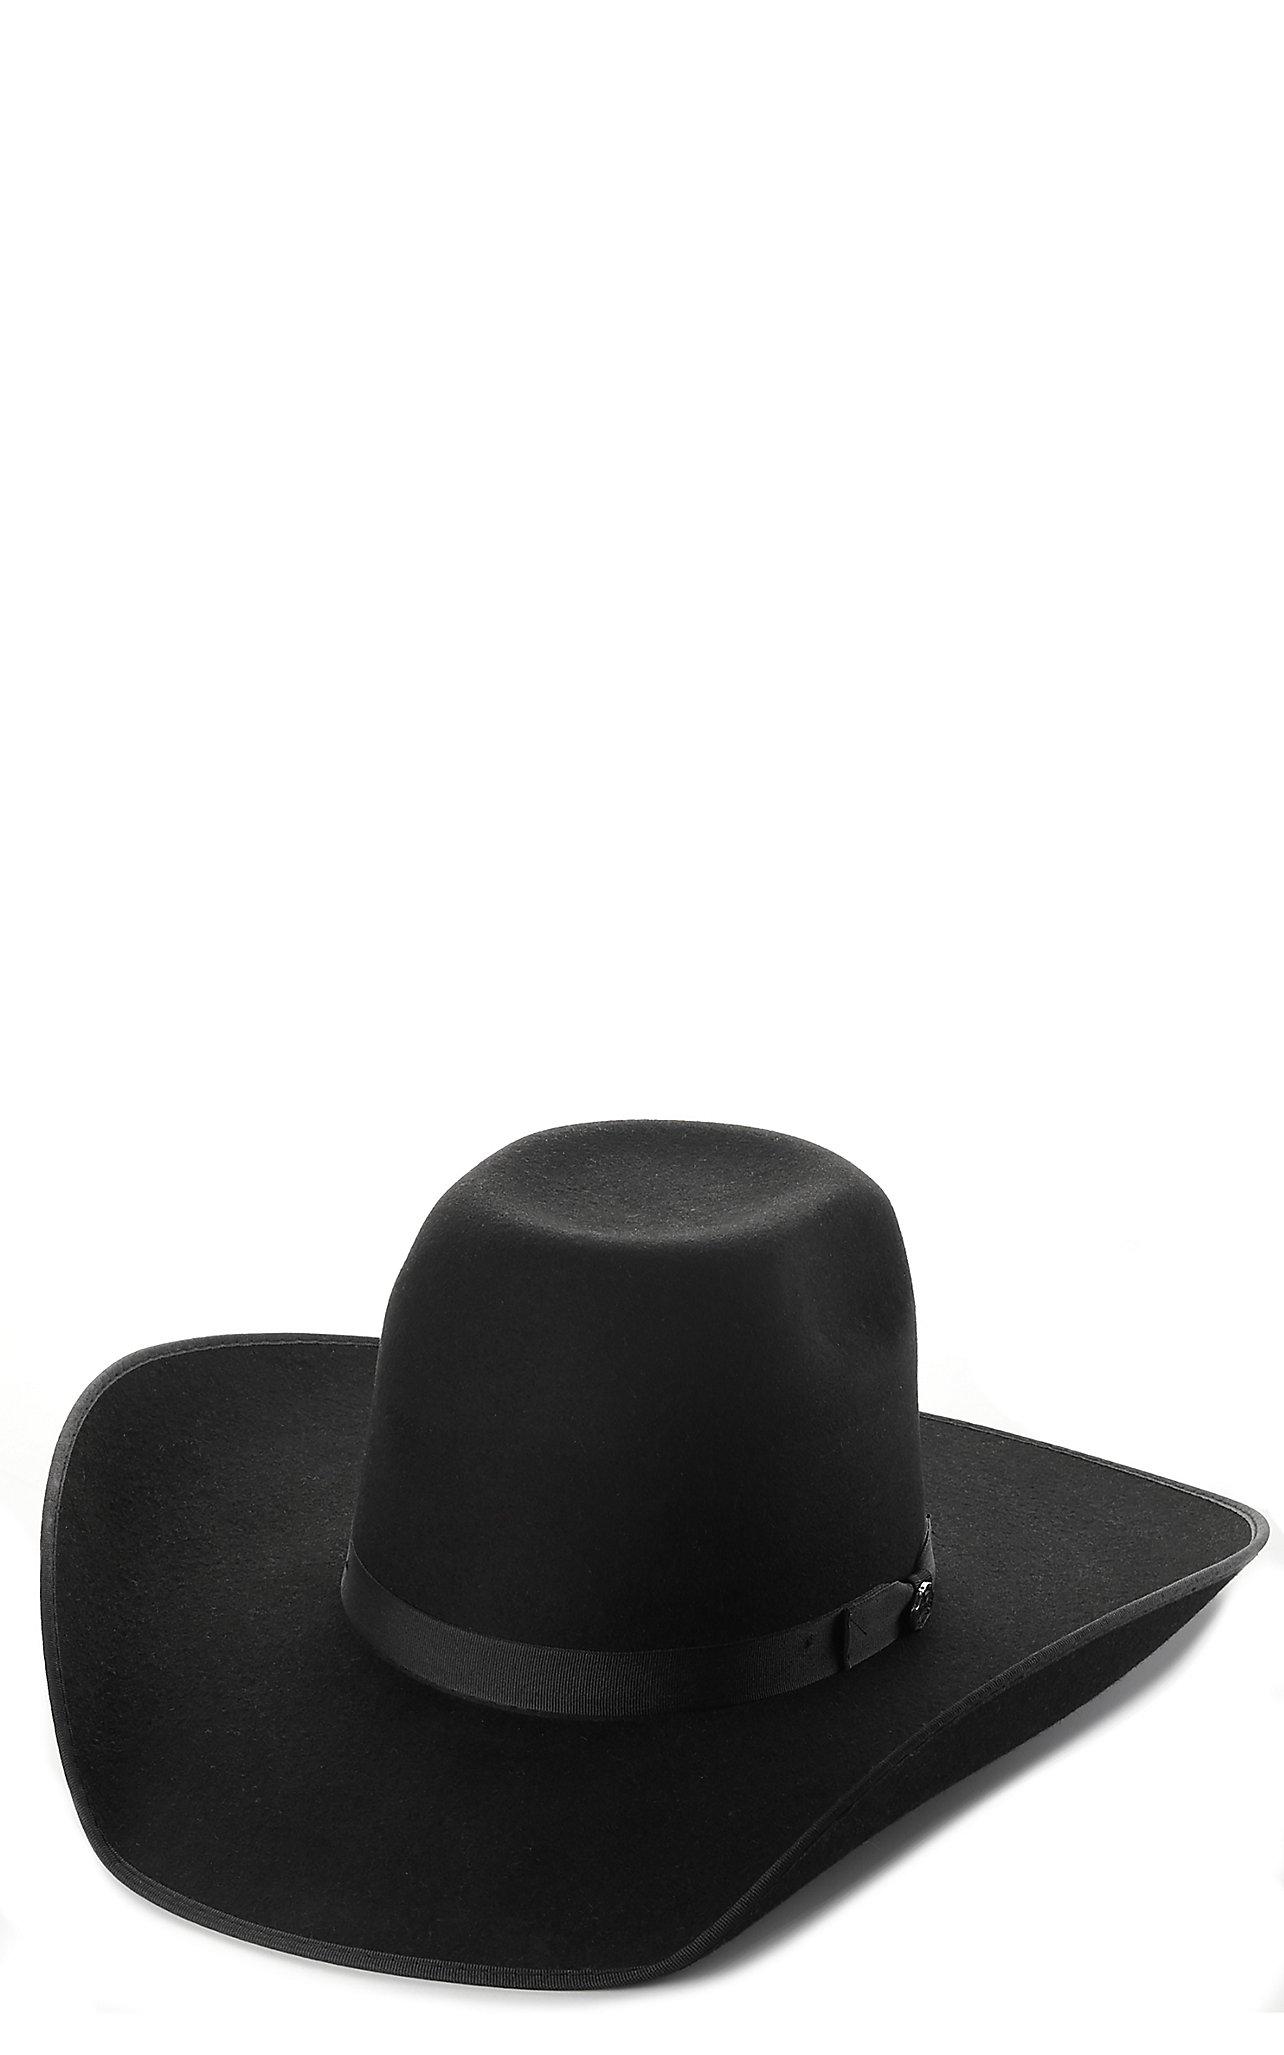 8f67c24bea9 Cavender s Cowboy Collection 3X Black Bull Rider Crown Premium Wool Cowboy  Hat